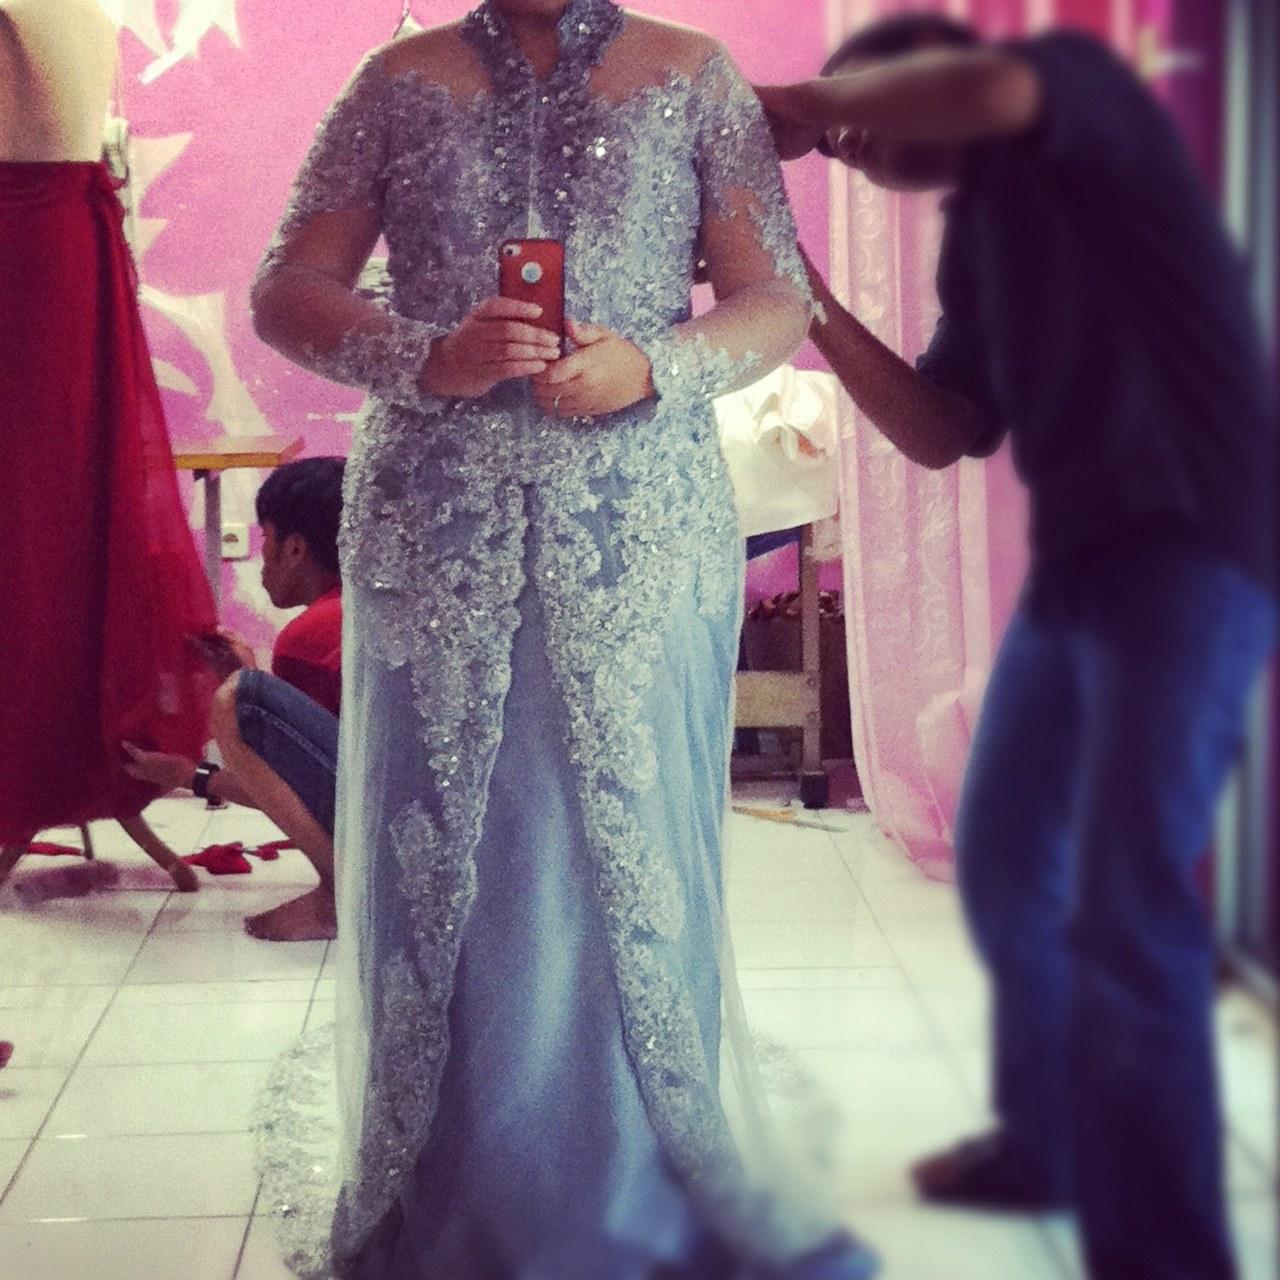 Design Sewa Baju Pengantin Muslimah Di Depok Ffdn Kiara butik – Depok Kebaya Nikah Kebaya Siraman Kebaya